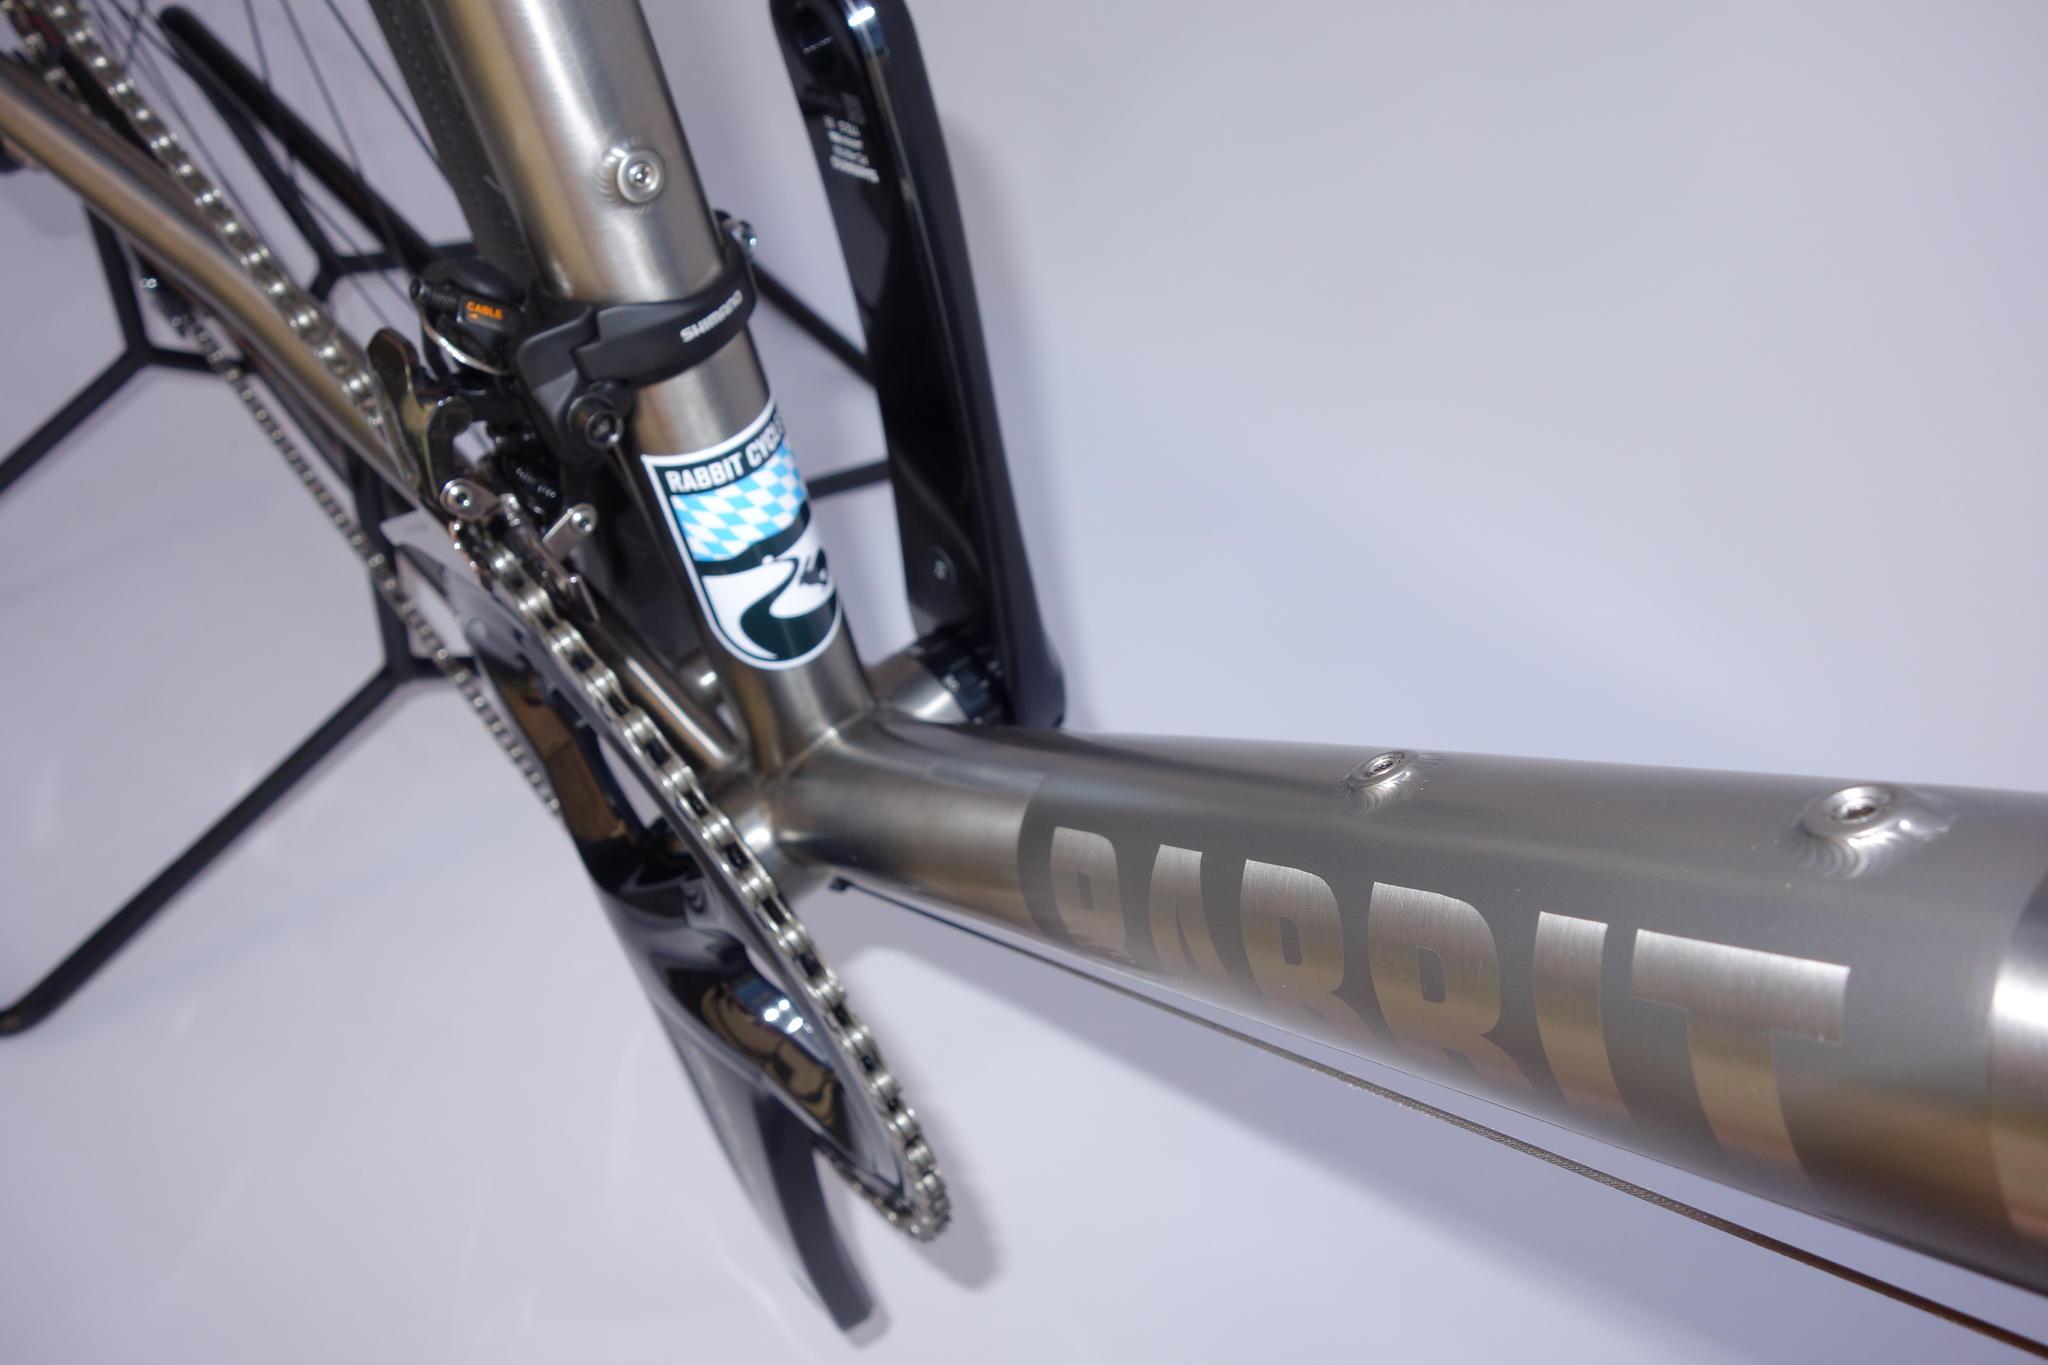 rabbit_cycles_titan_road_classic_dsc03061